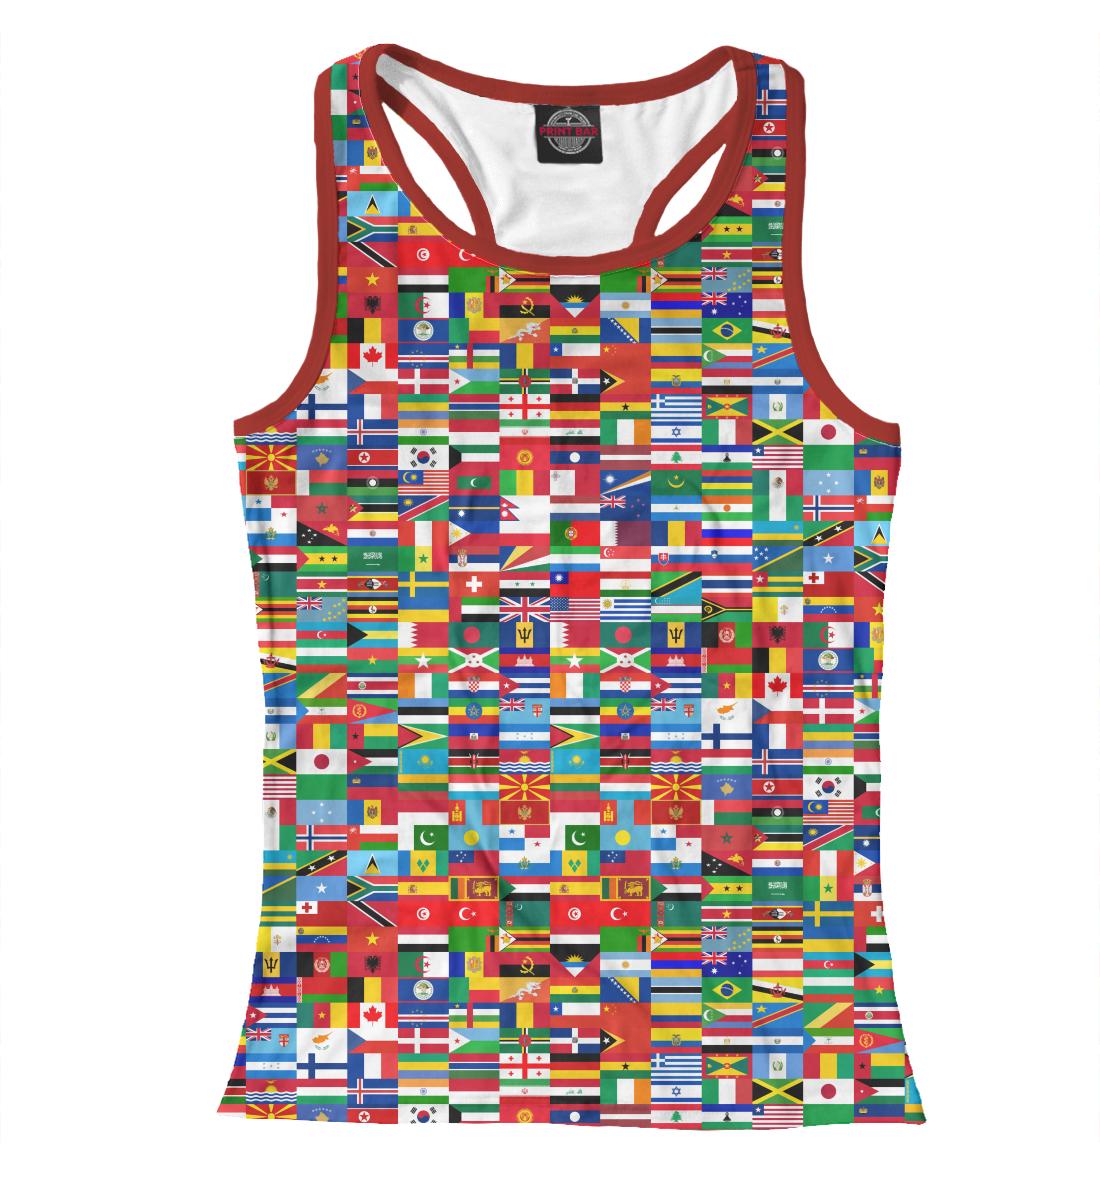 Купить Флаги мира, Printbar, Майки борцовки, HIP-570419-mayb-1